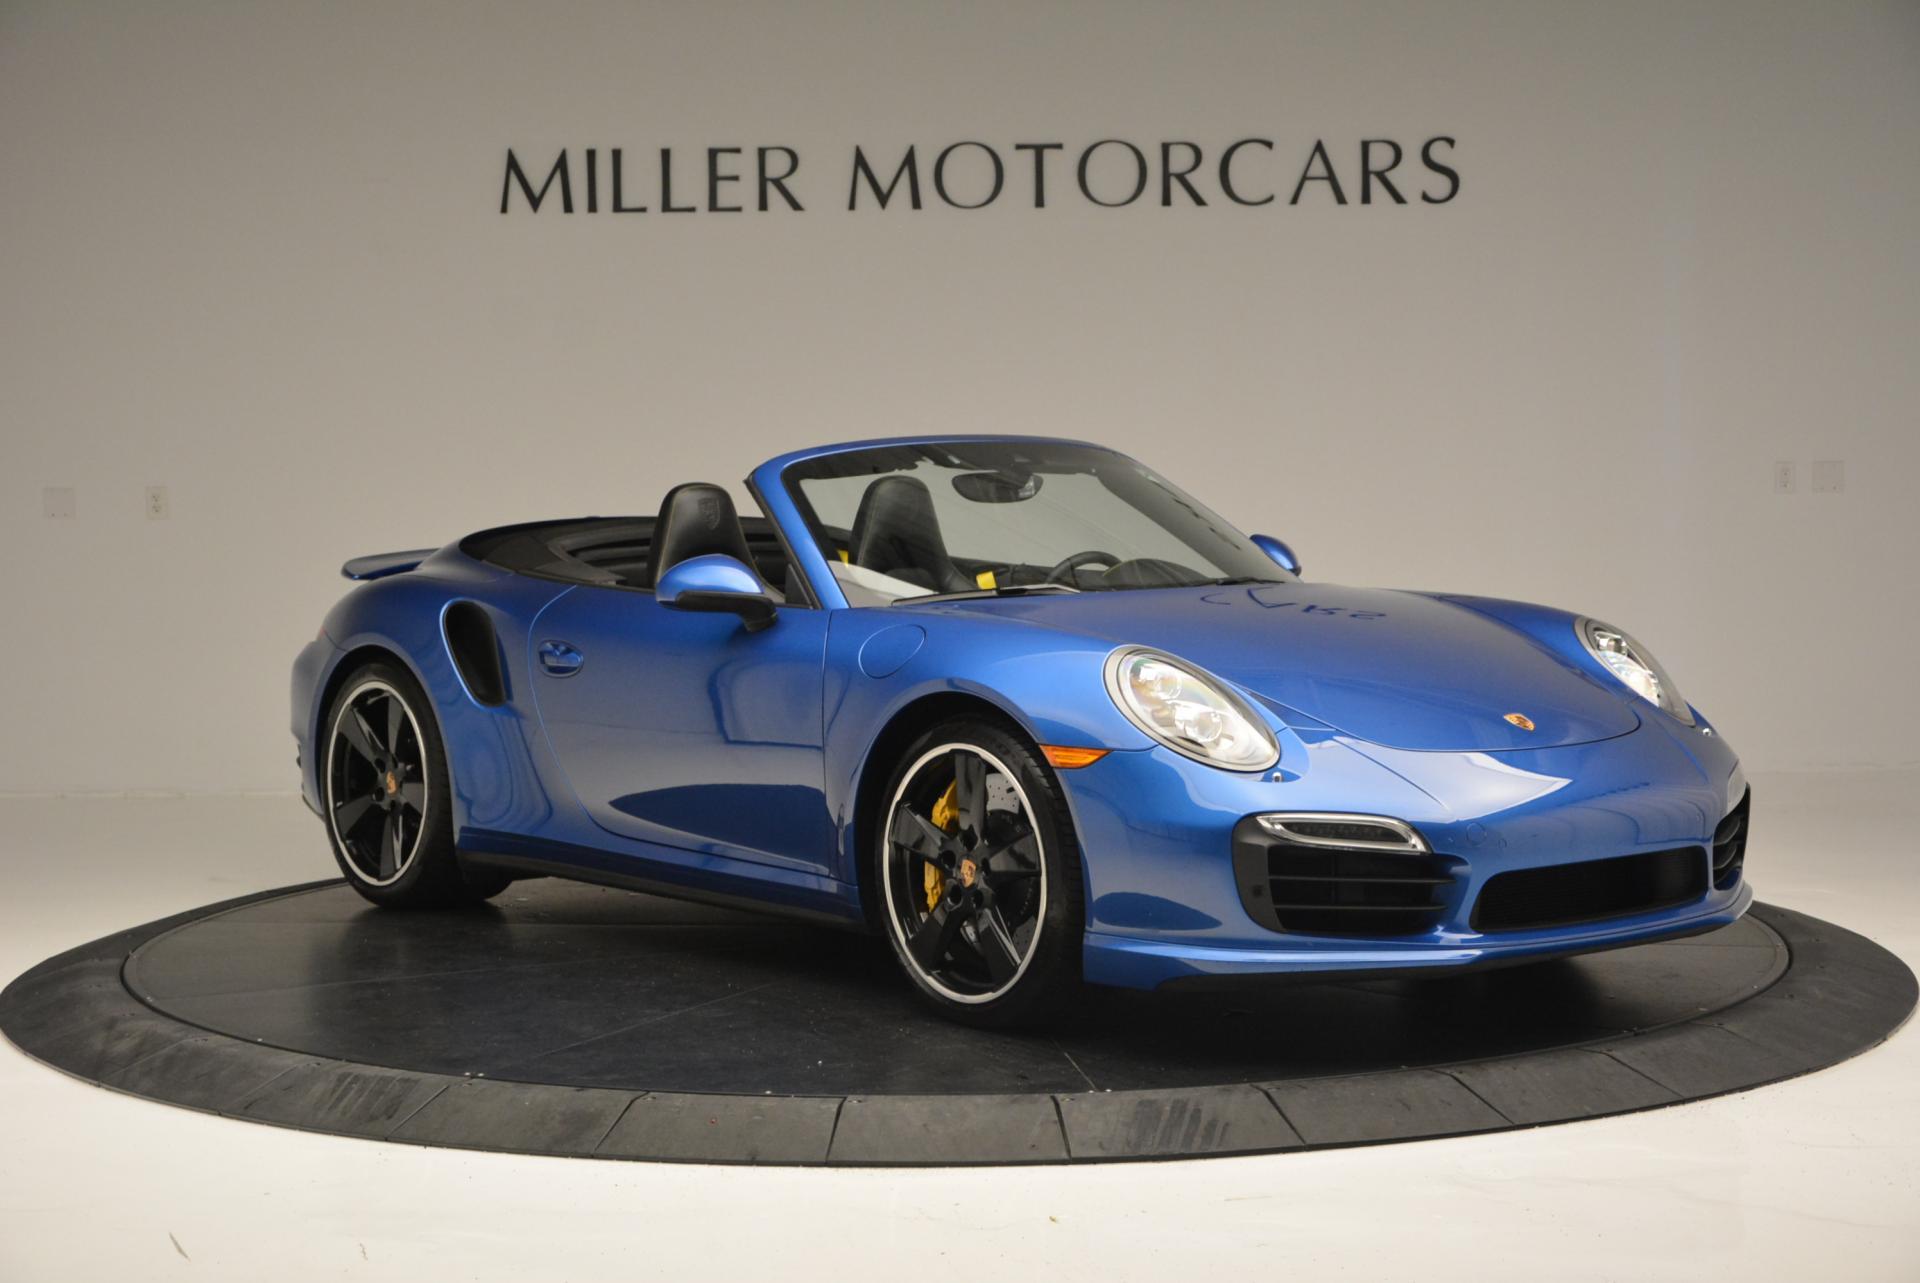 Used 2014 Porsche 911 Turbo S For Sale In Greenwich, CT 105_p12